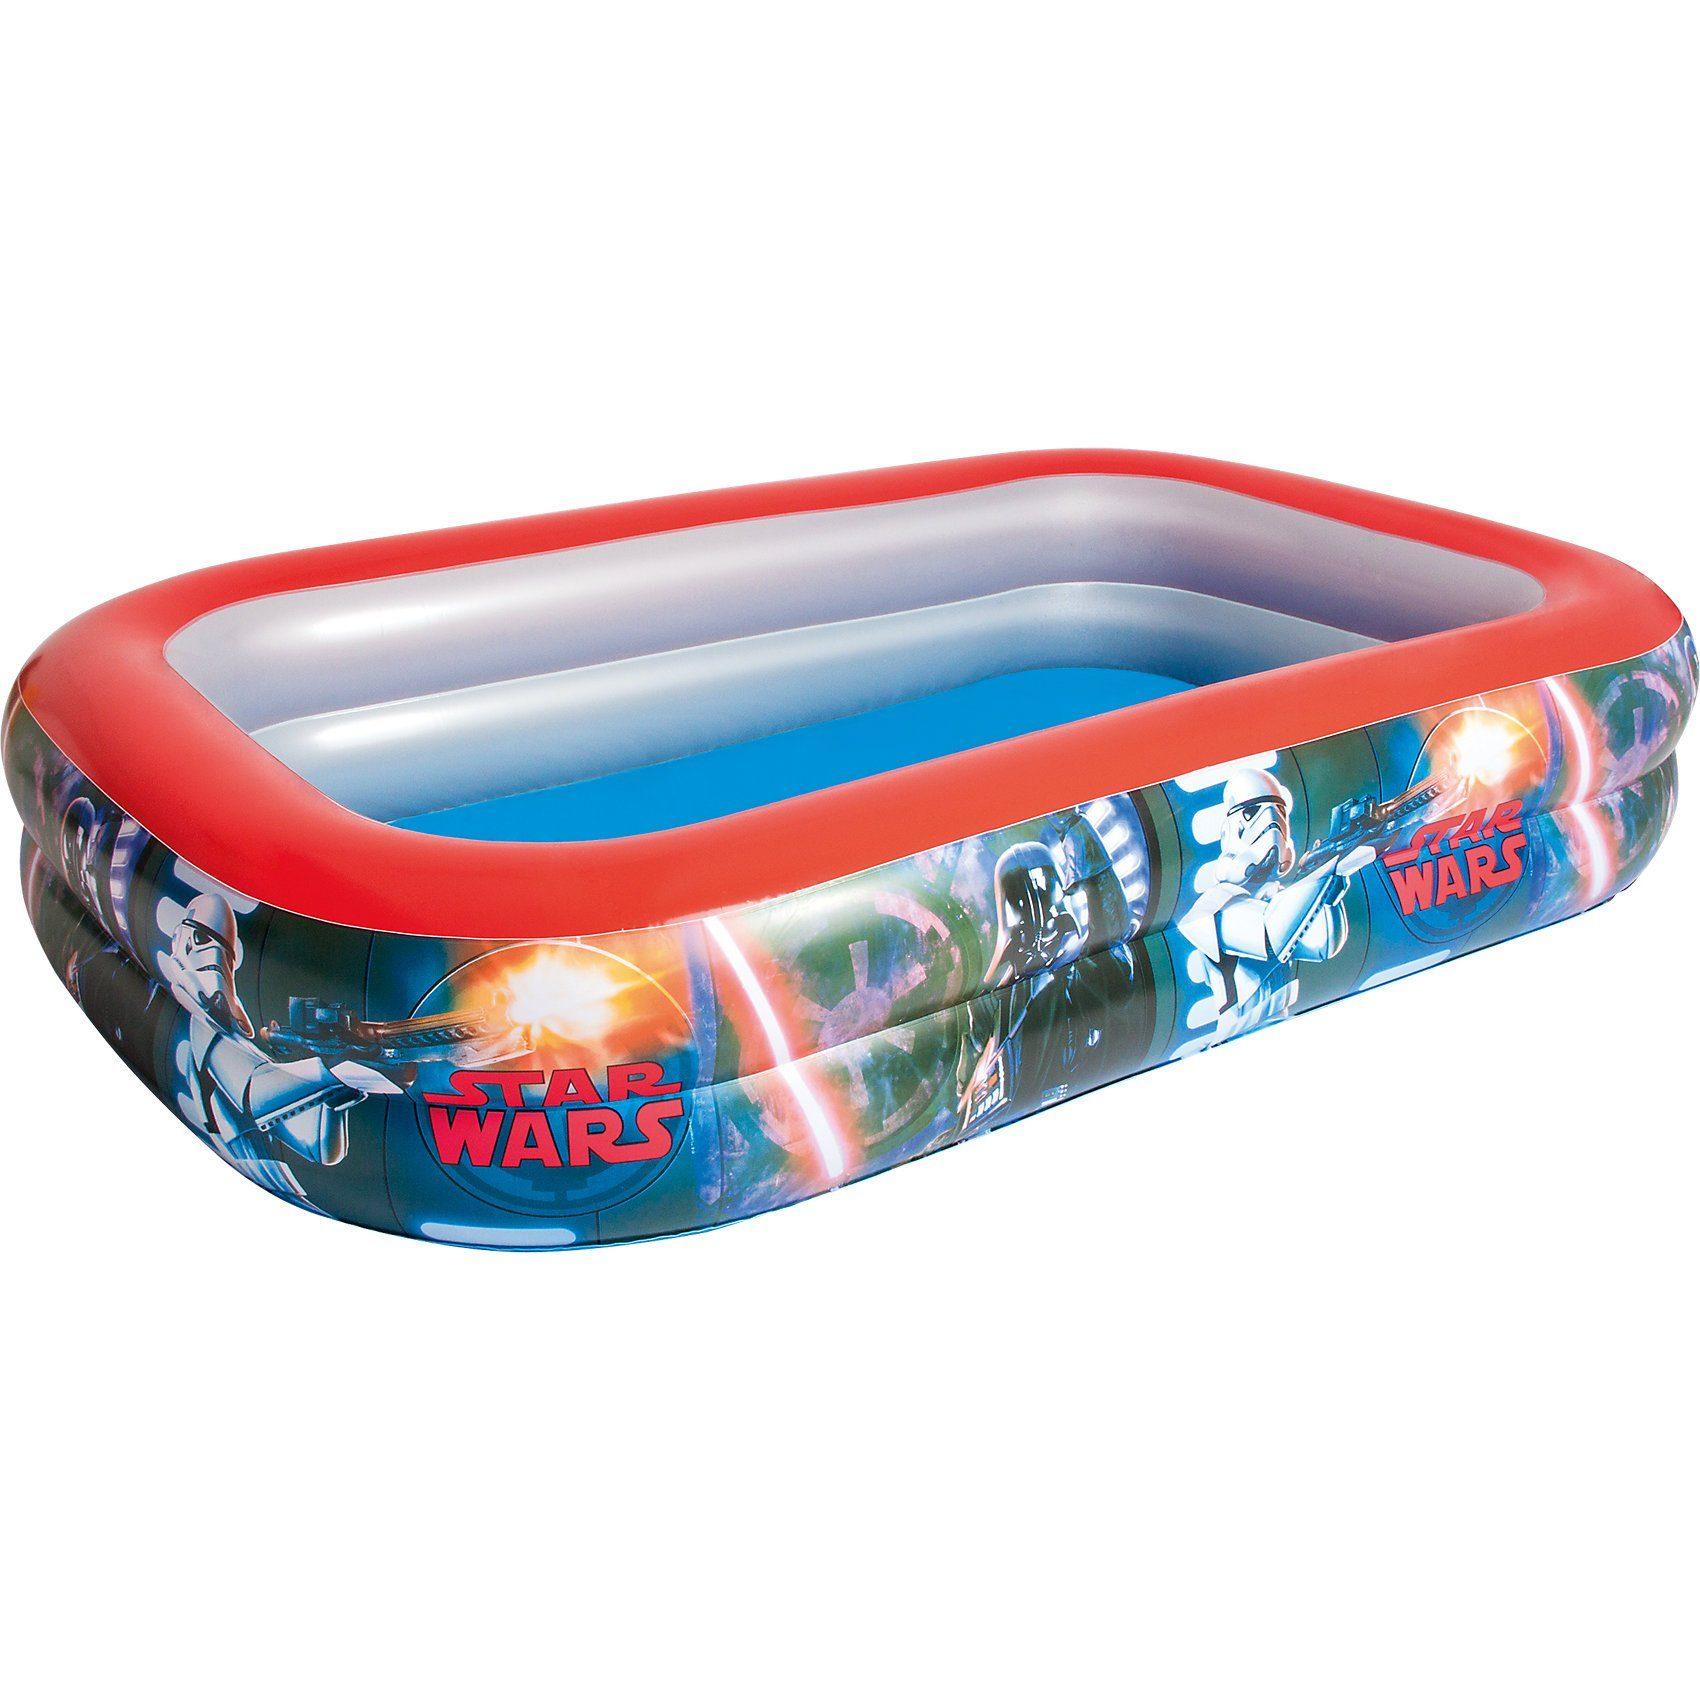 Bestway Planschbecken Star Wars Family Pool 262 x 175 x 51cm